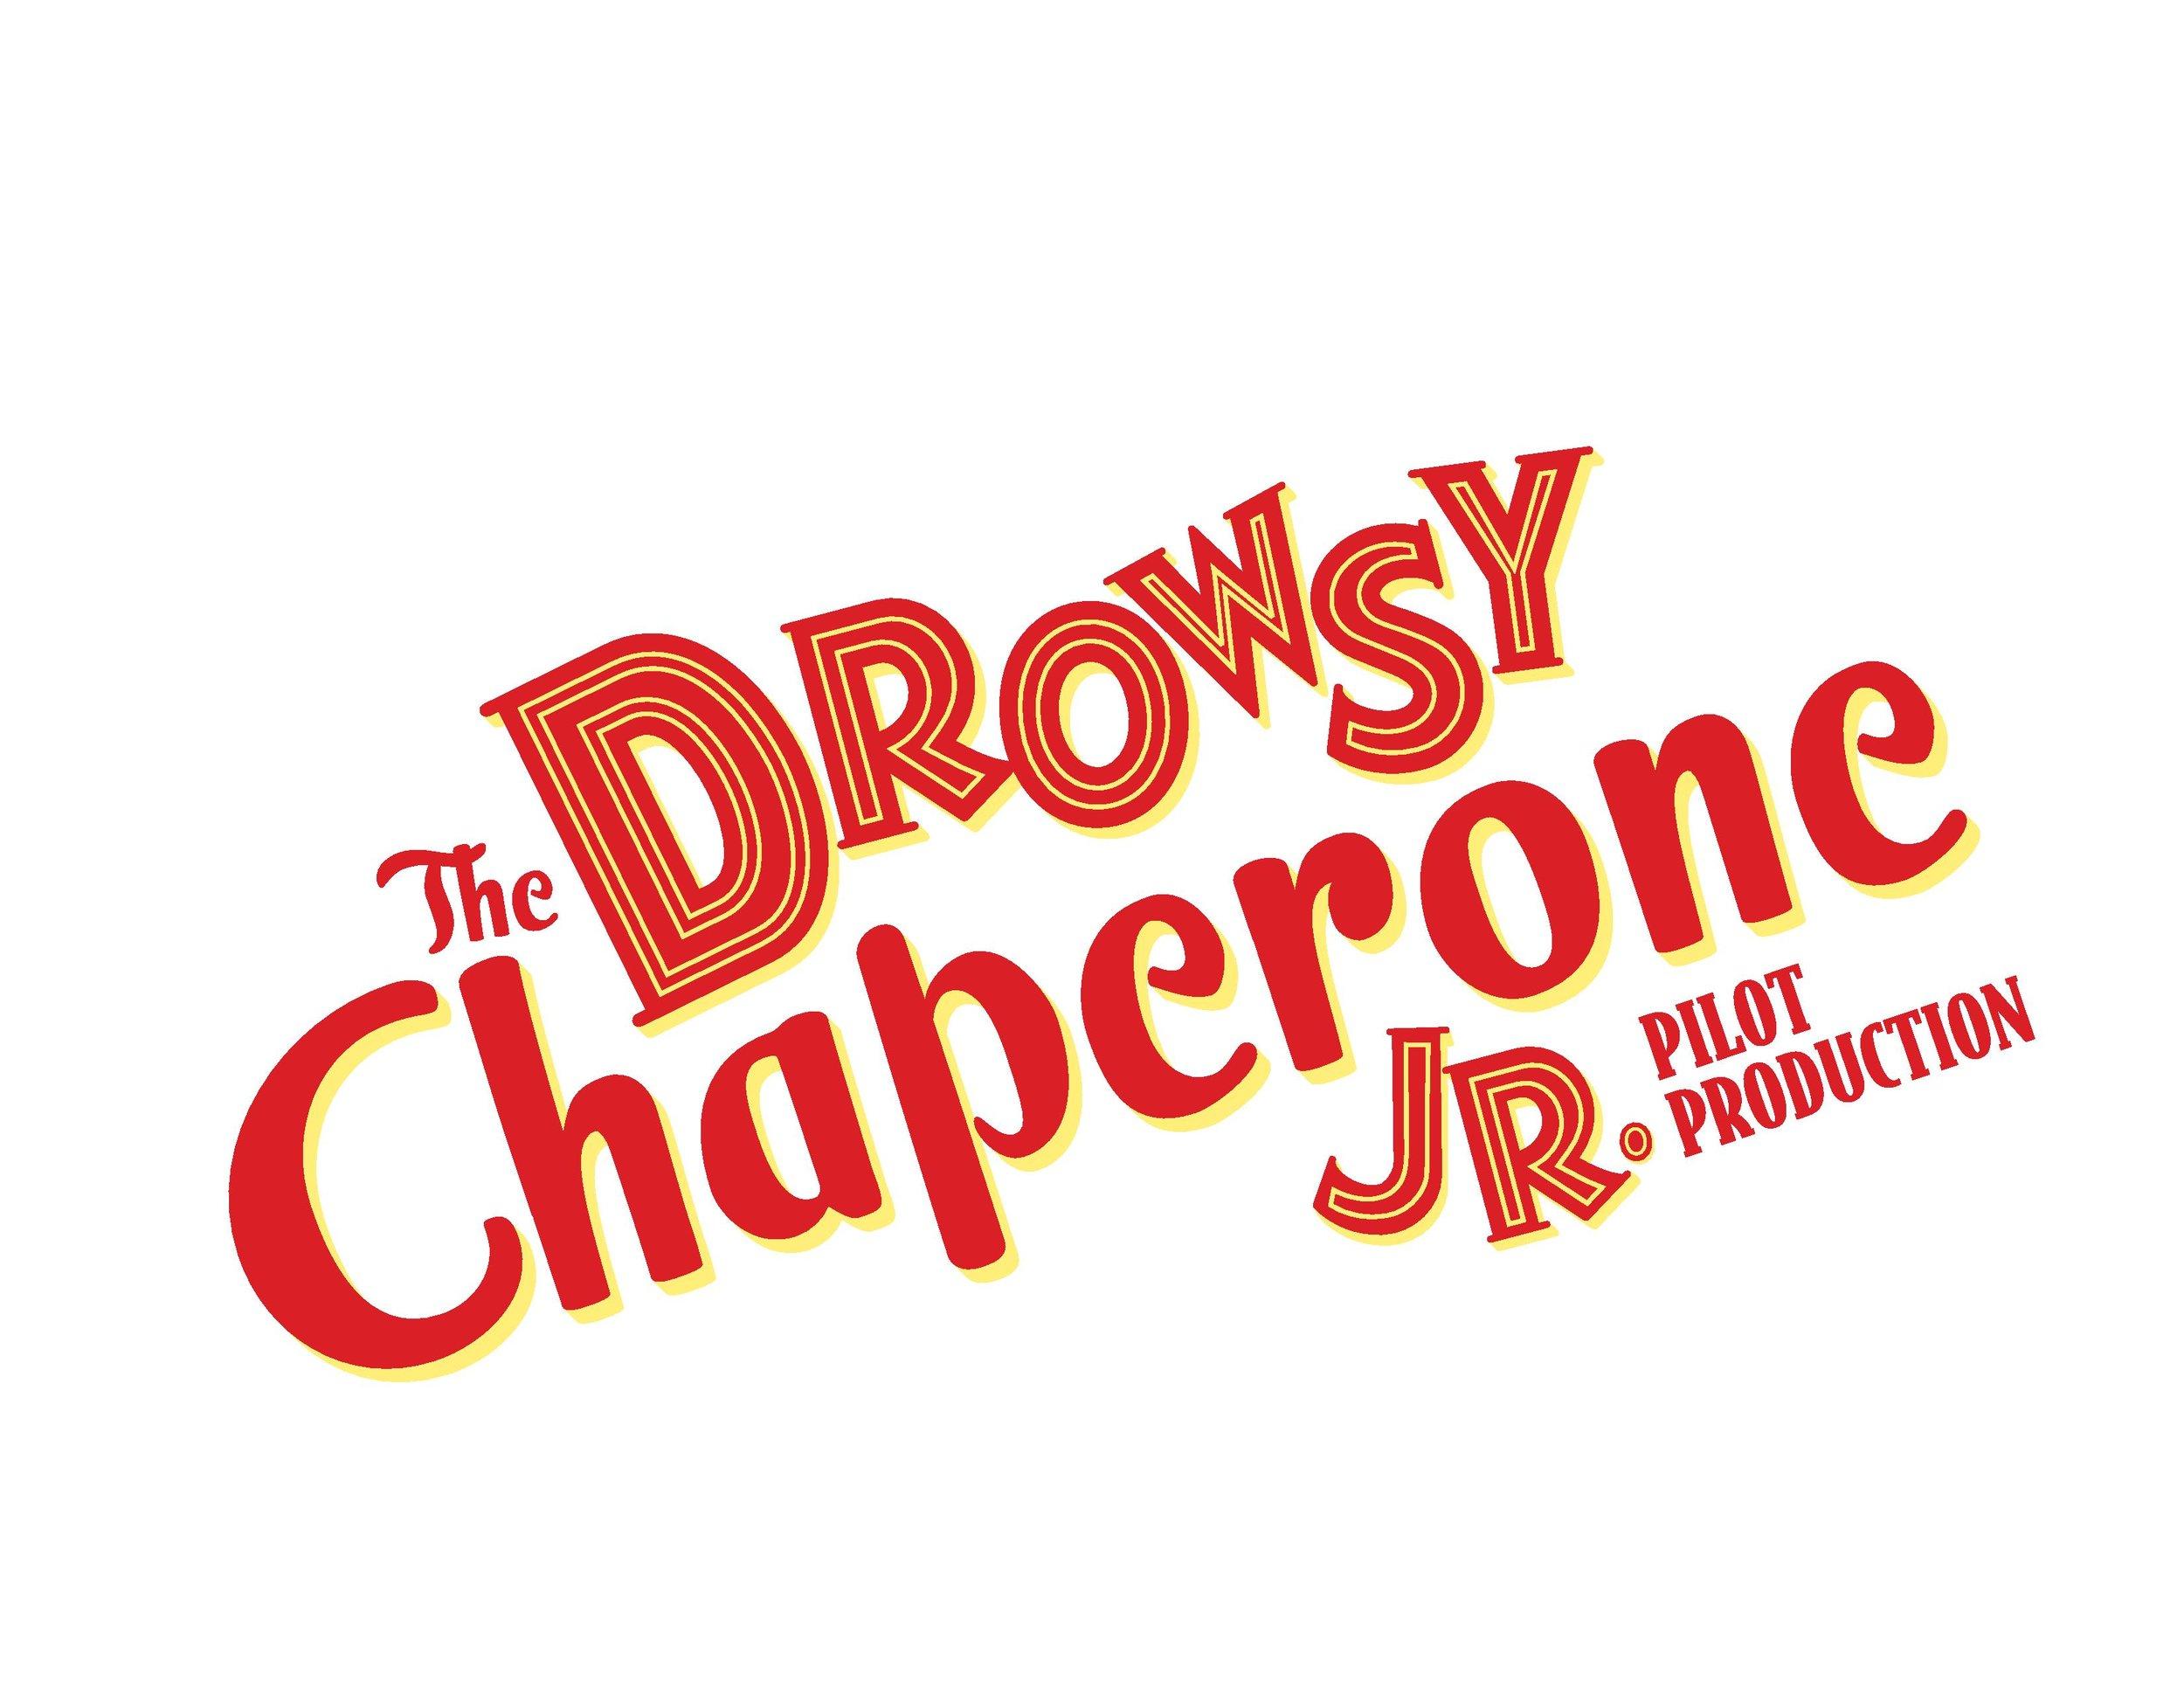 Drowsy JR Pilot Production Title Treatments-page-001.jpg